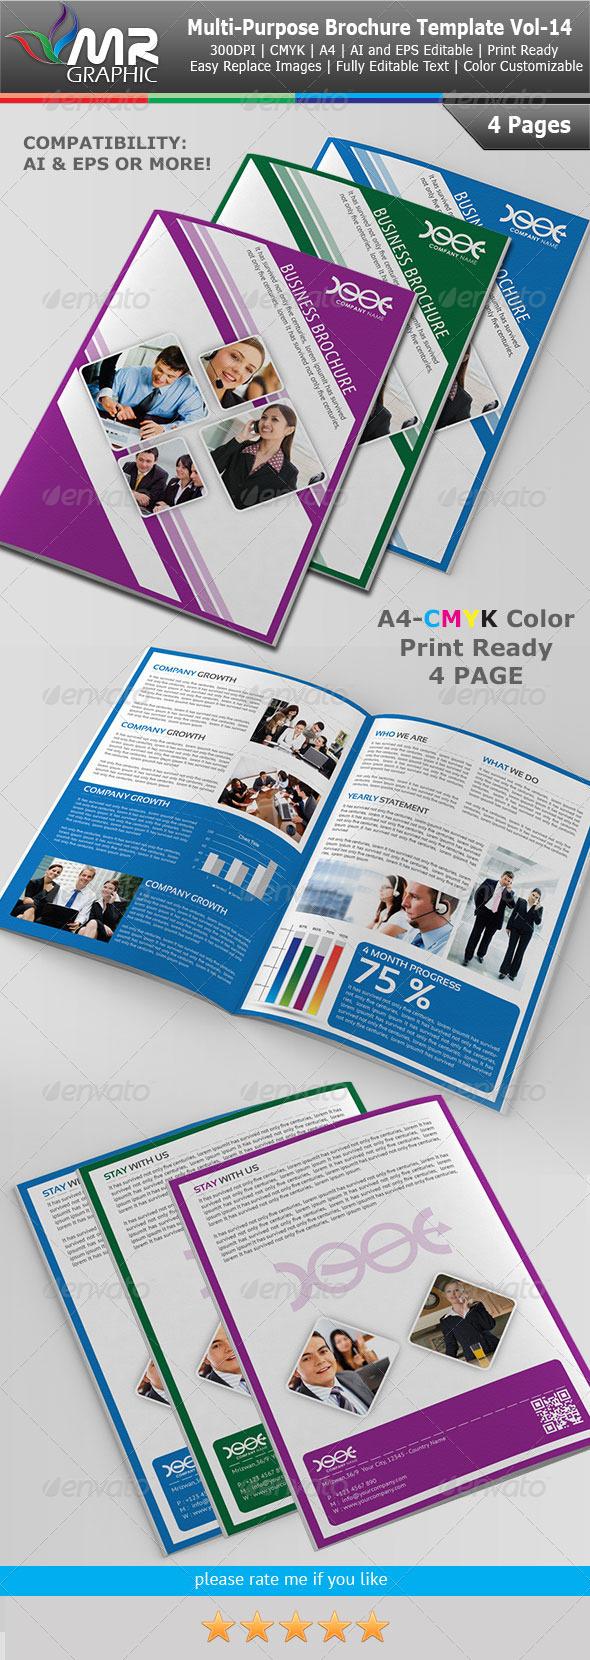 GraphicRiver Multipurpose Business Brochure Vol-14 4104847